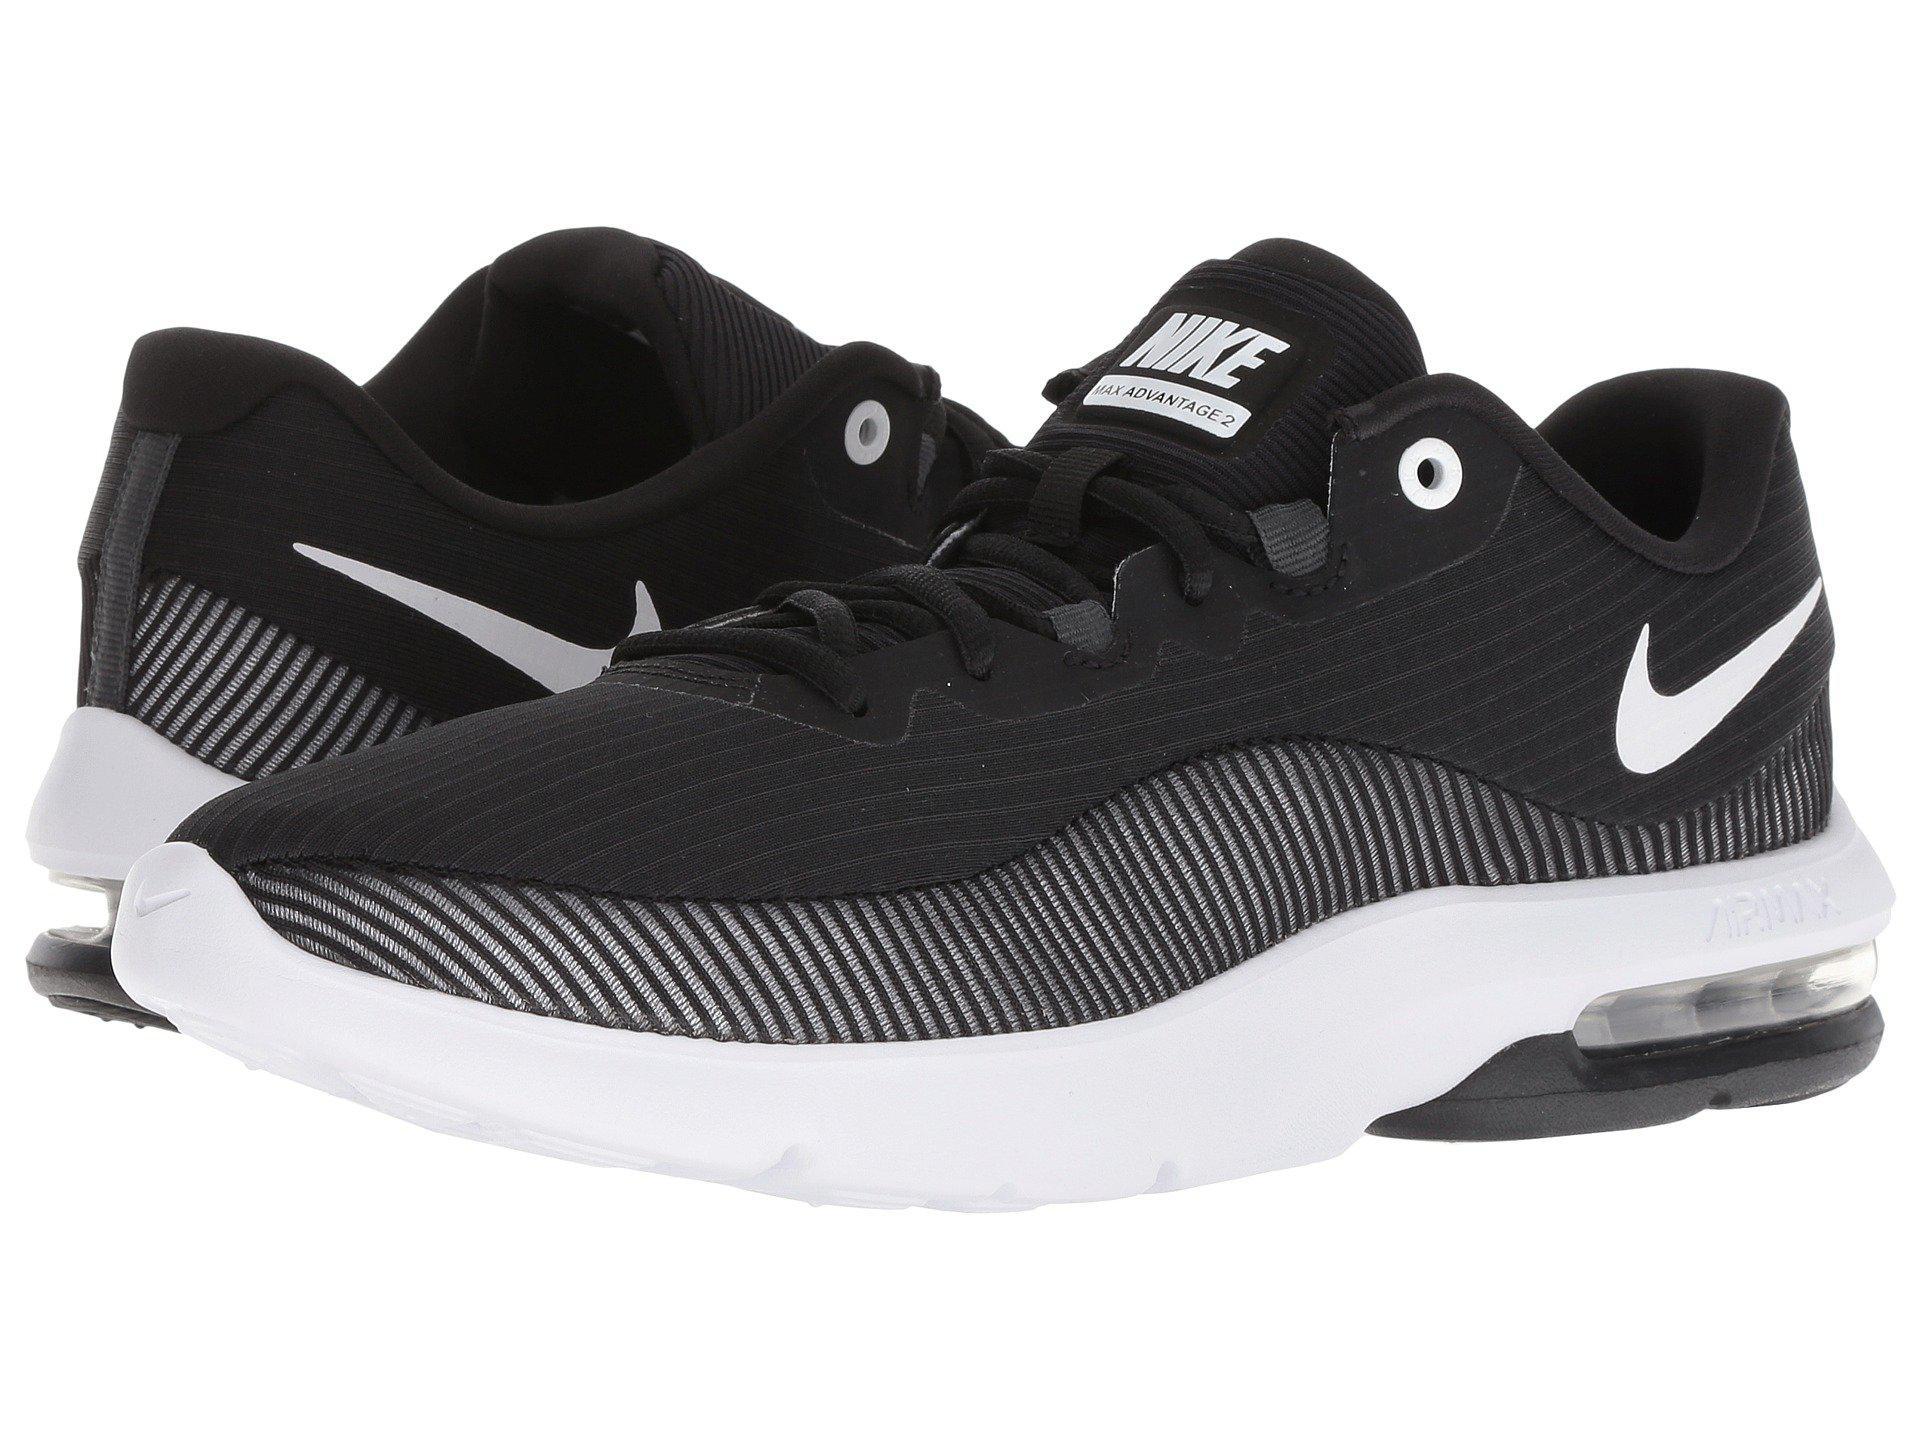 4484e8458f0 Lyst - Nike Air Max Advantage 2 (white red Orbit wolf Grey) Men s ...